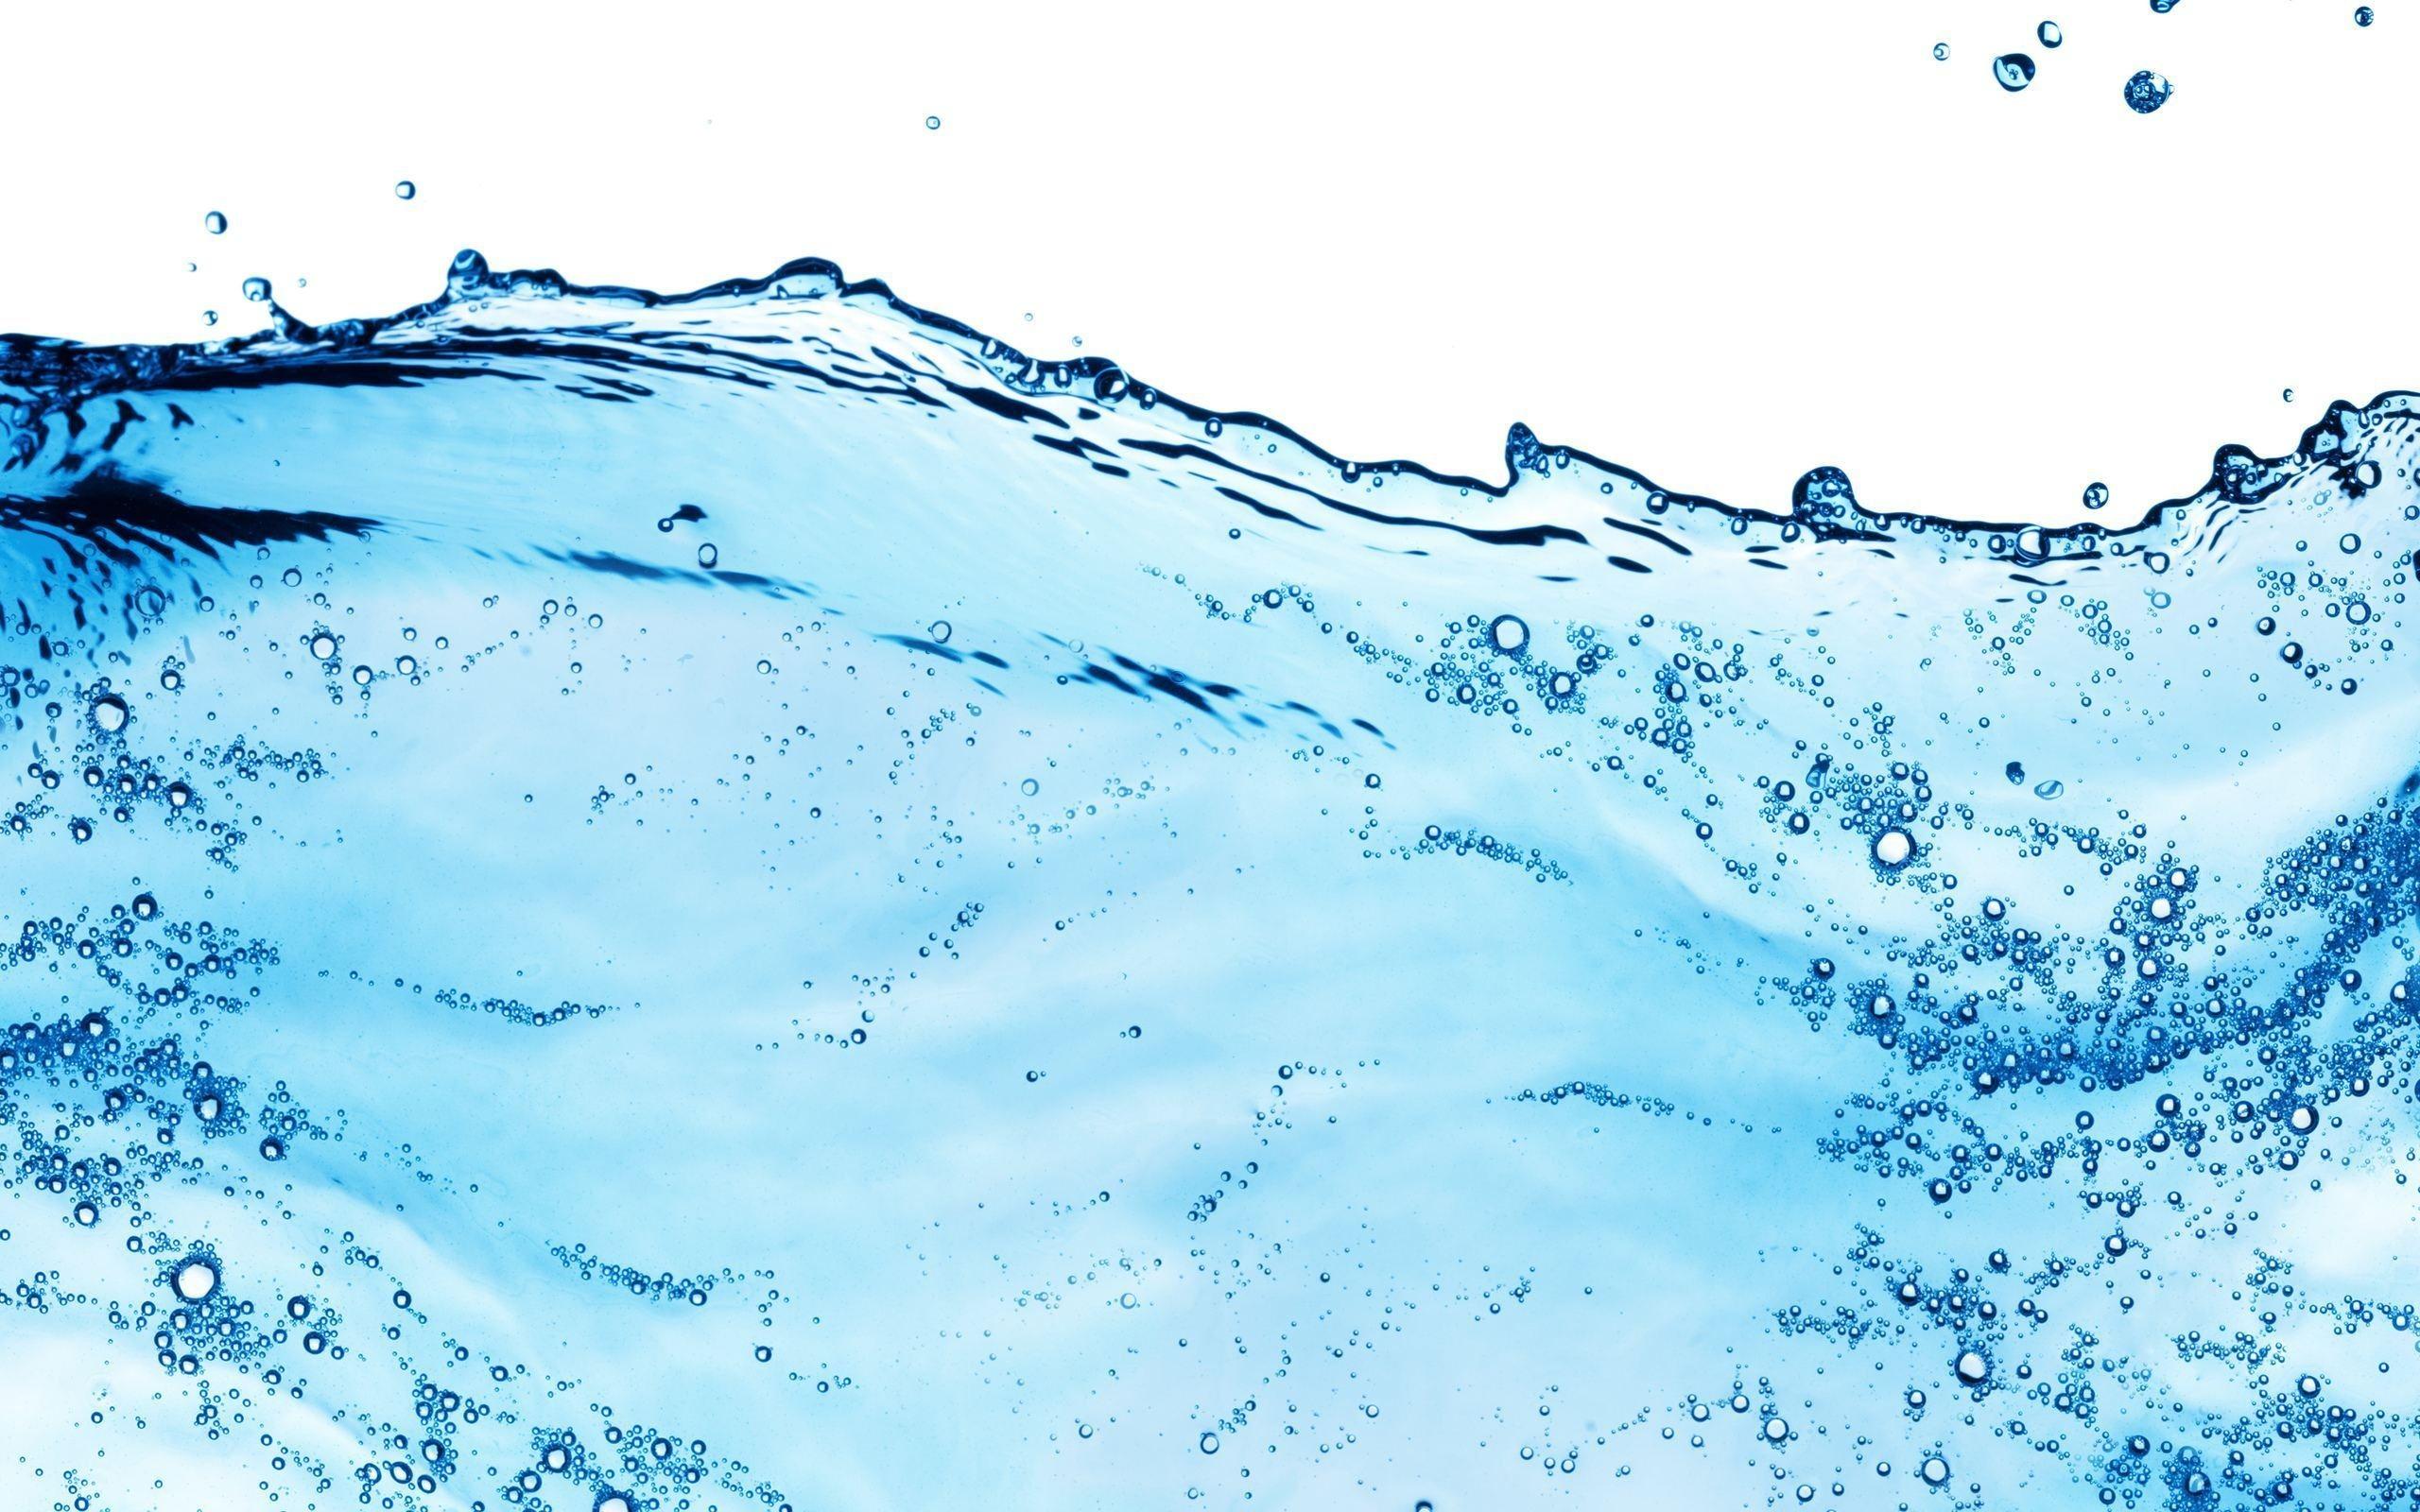 Deep Water   Wallpaper Pin it 2560x1600